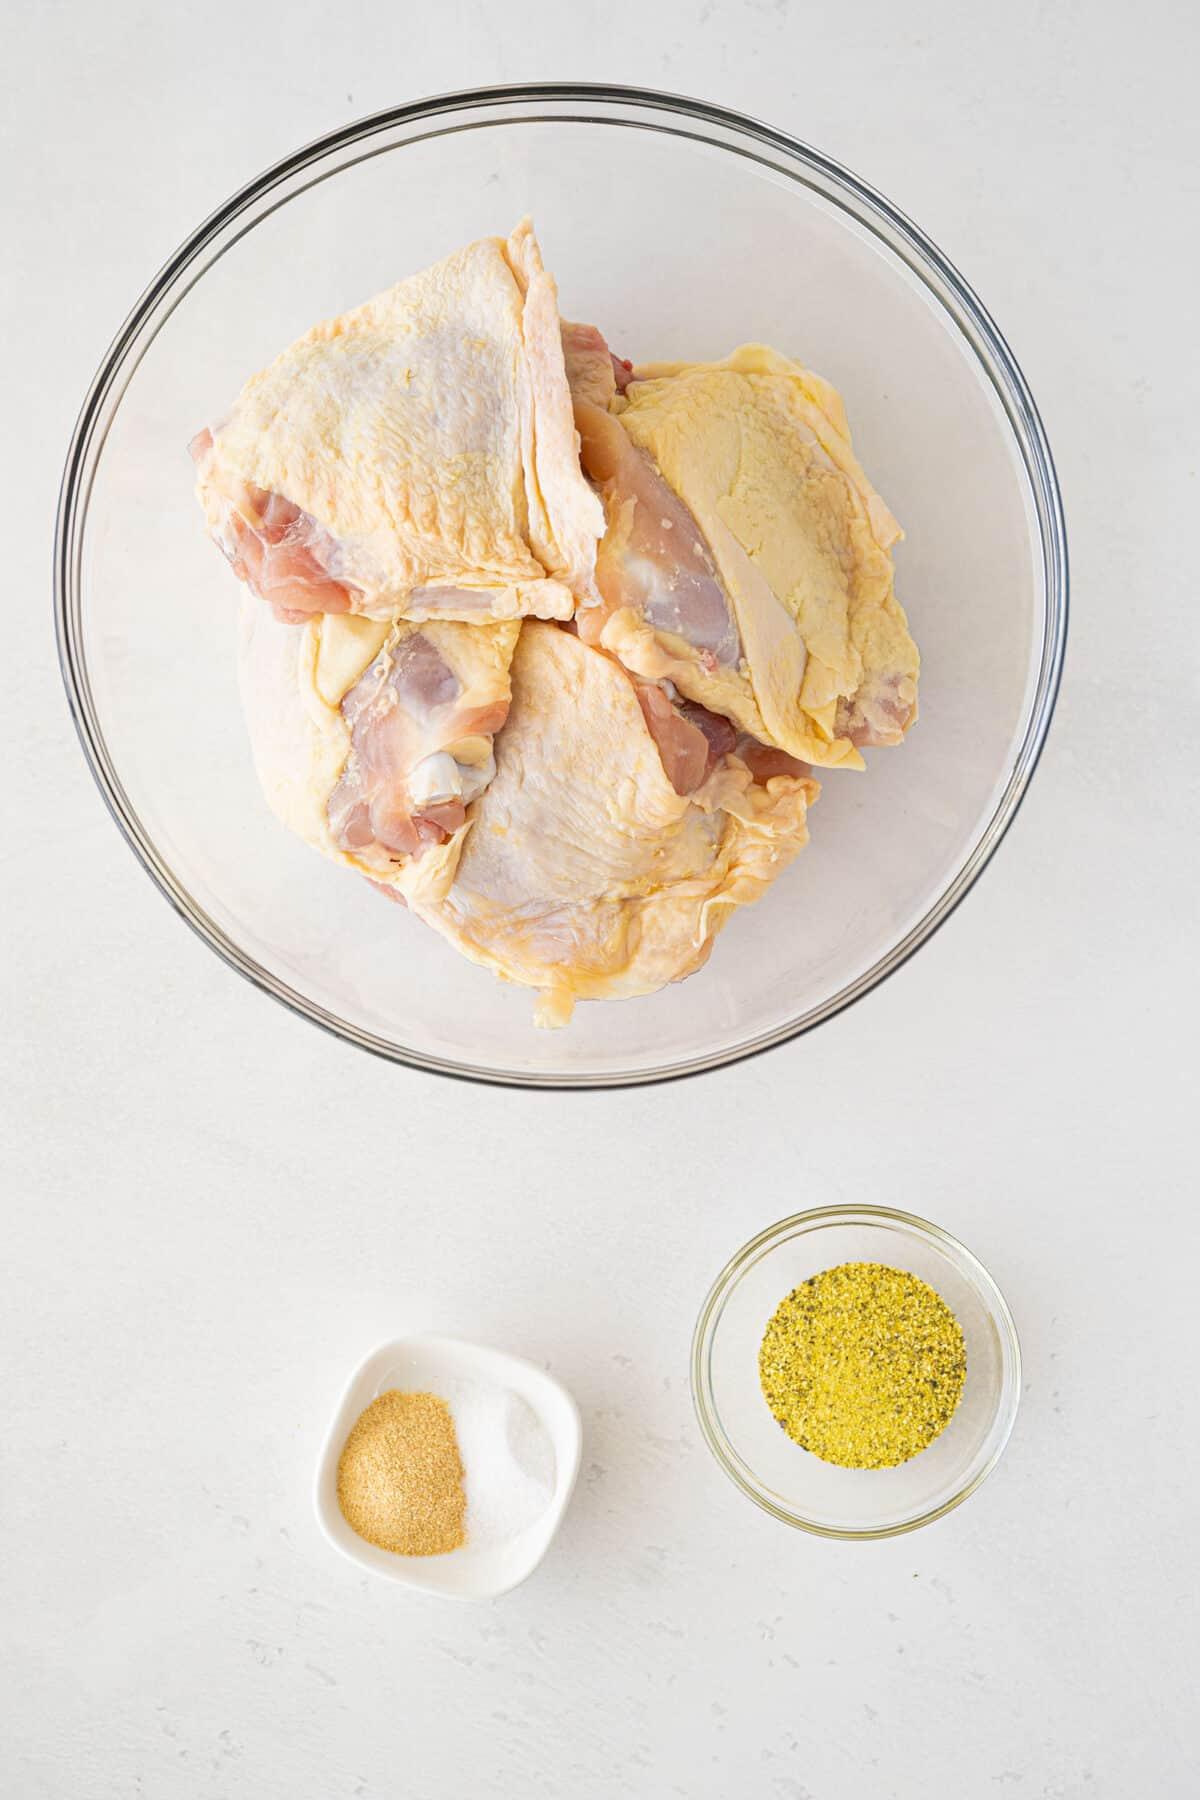 lemon pepper chicken ingredients